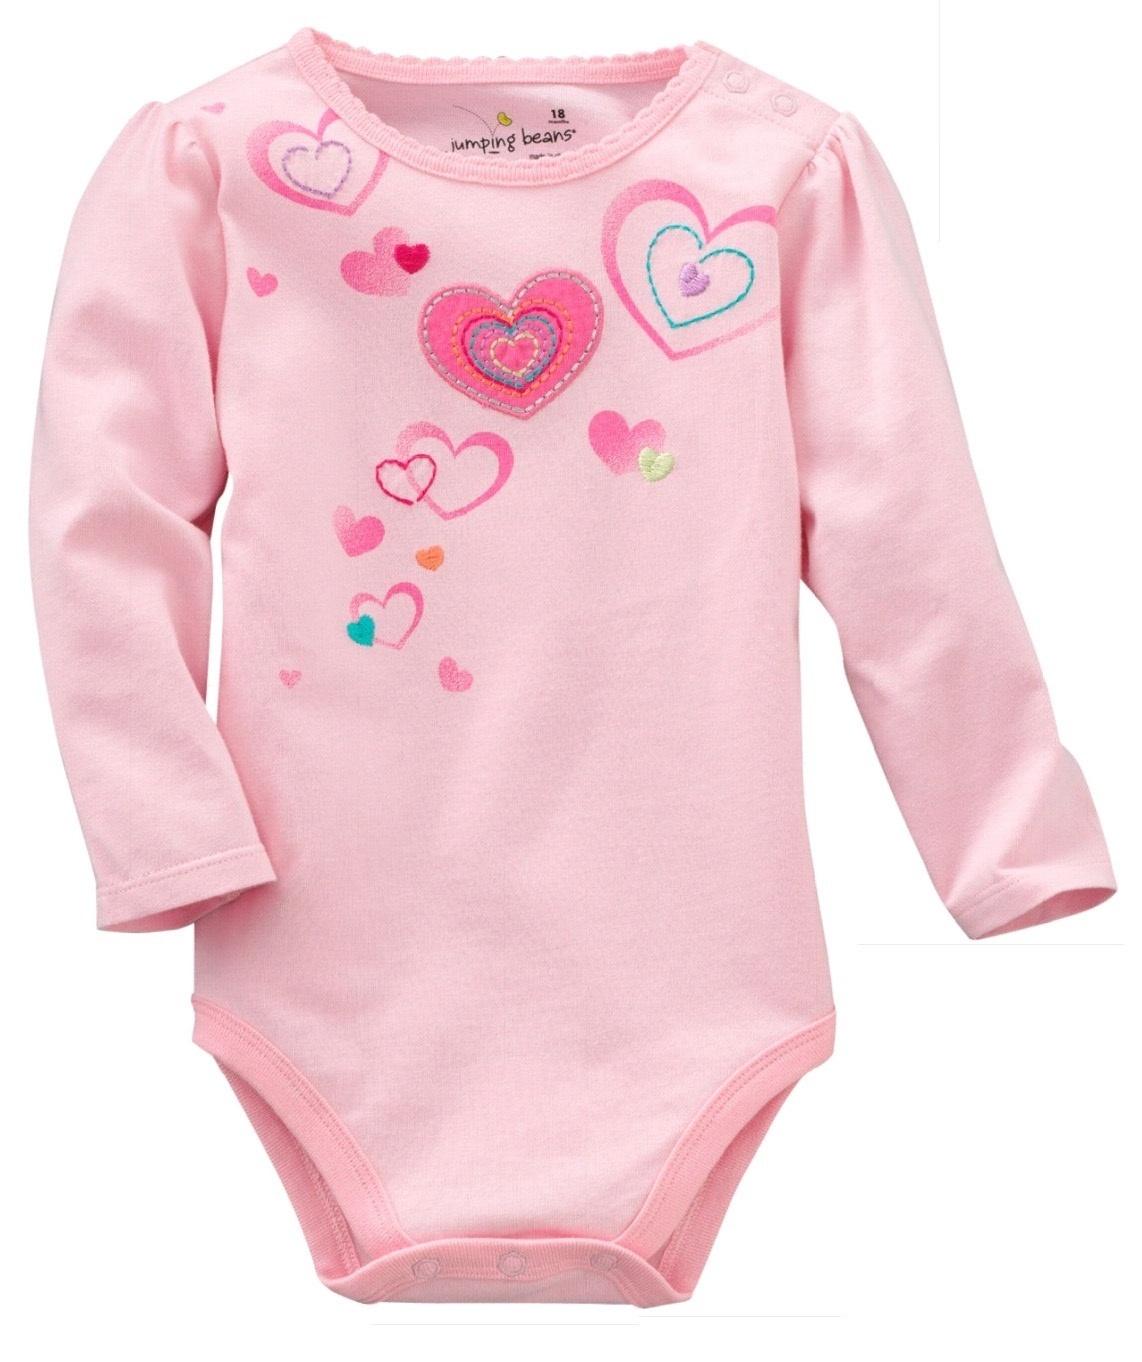 Http List Item Mozart Effect Cds Soothing Music Kewpie Baby Foaming Shampoo Refill 300ml 566926680 01g 0 W St G